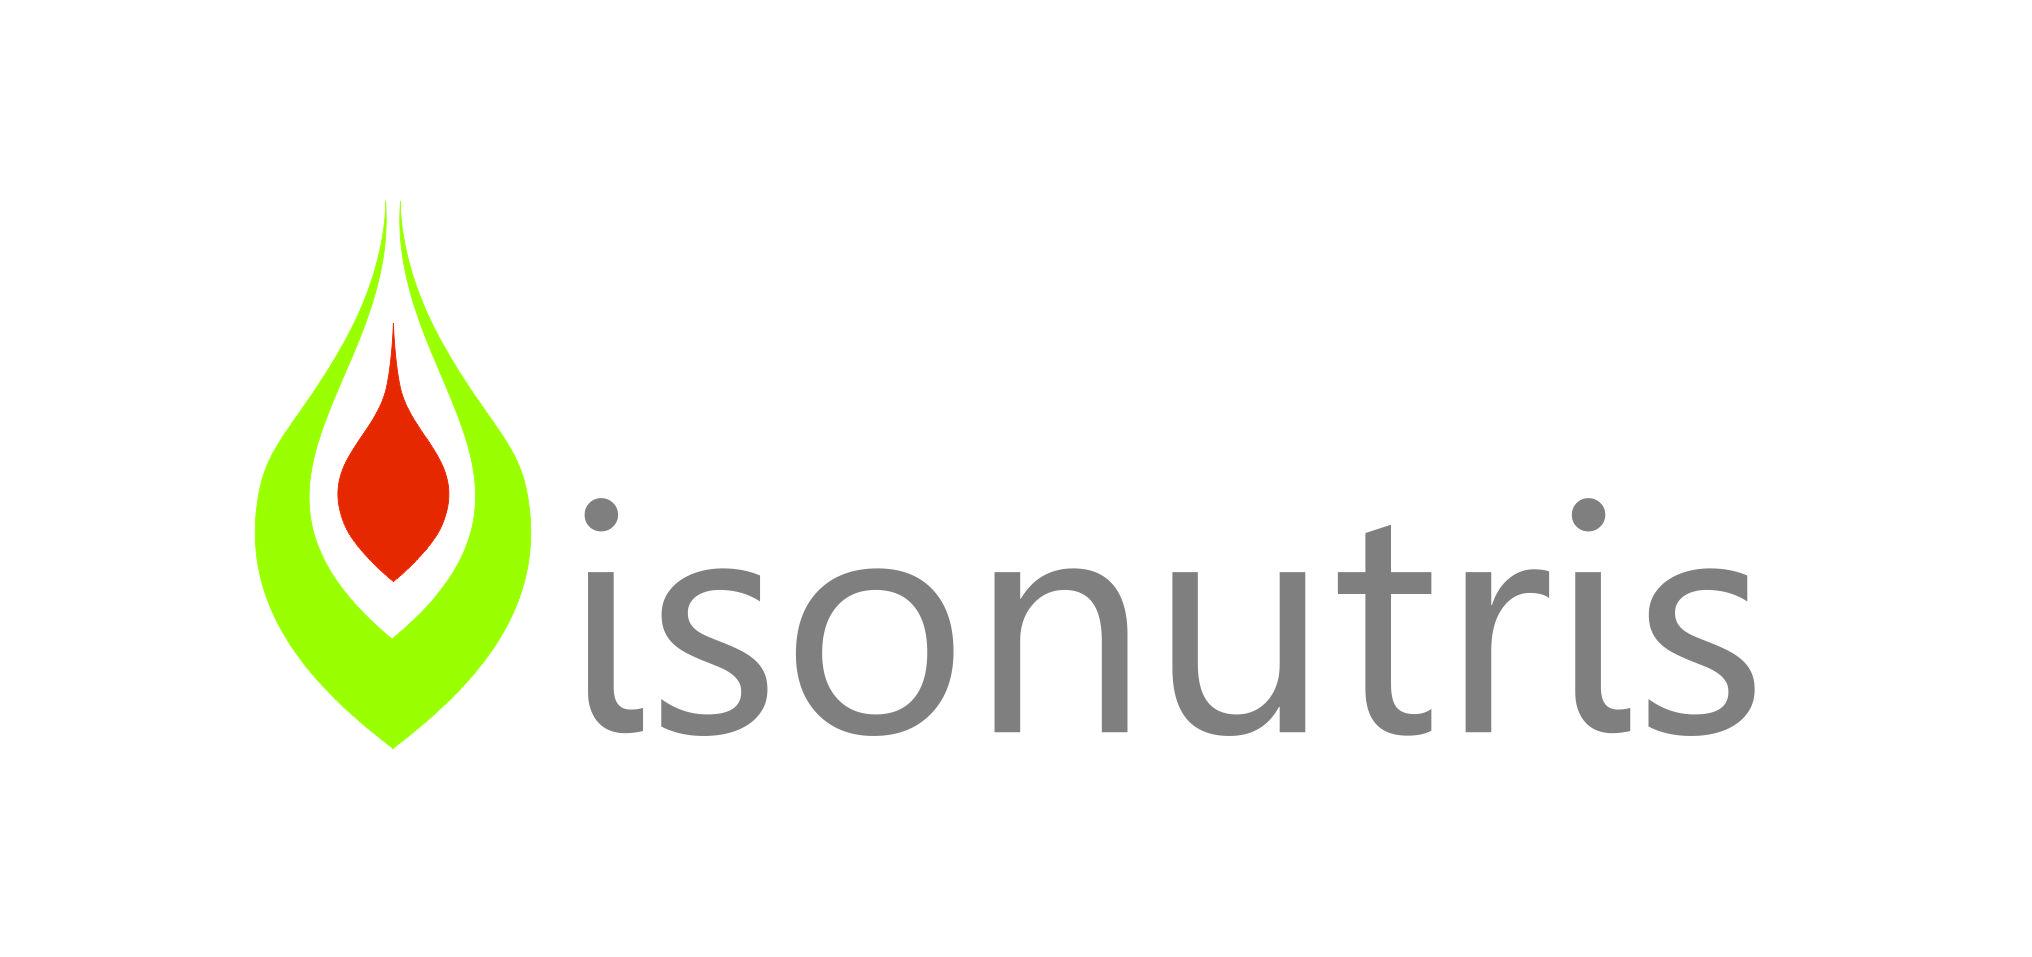 Isonutris